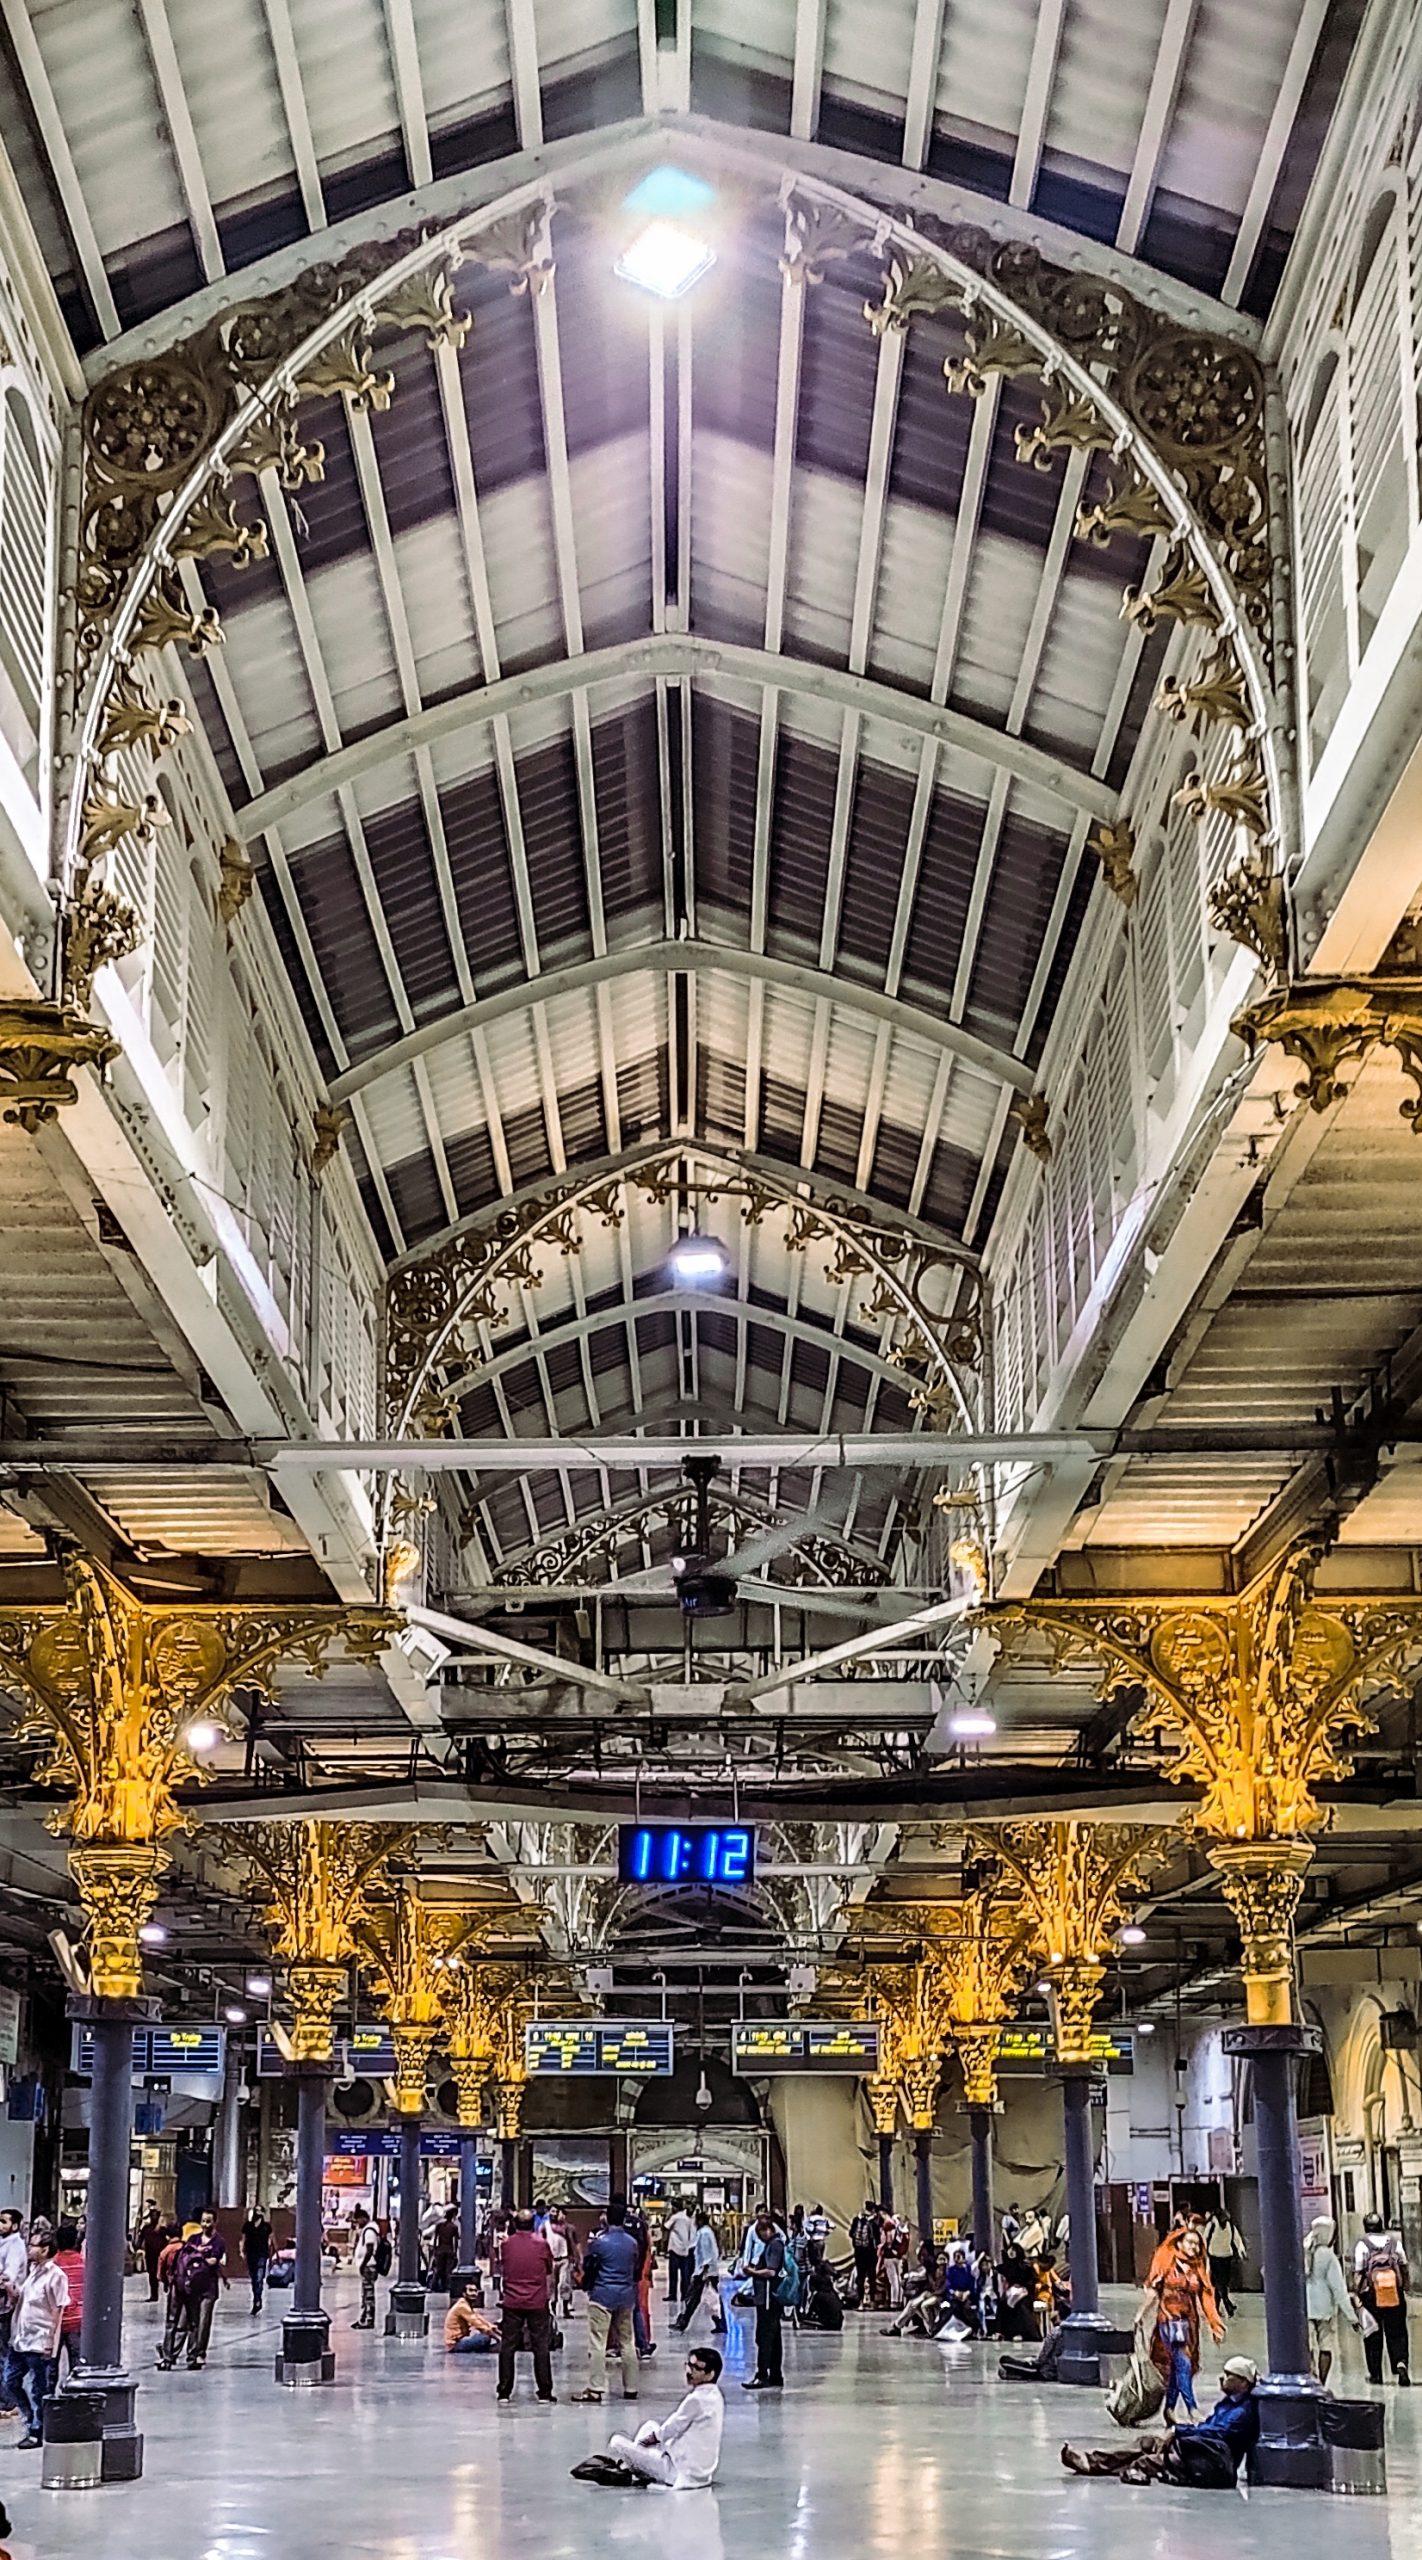 CST railway station Mumbai